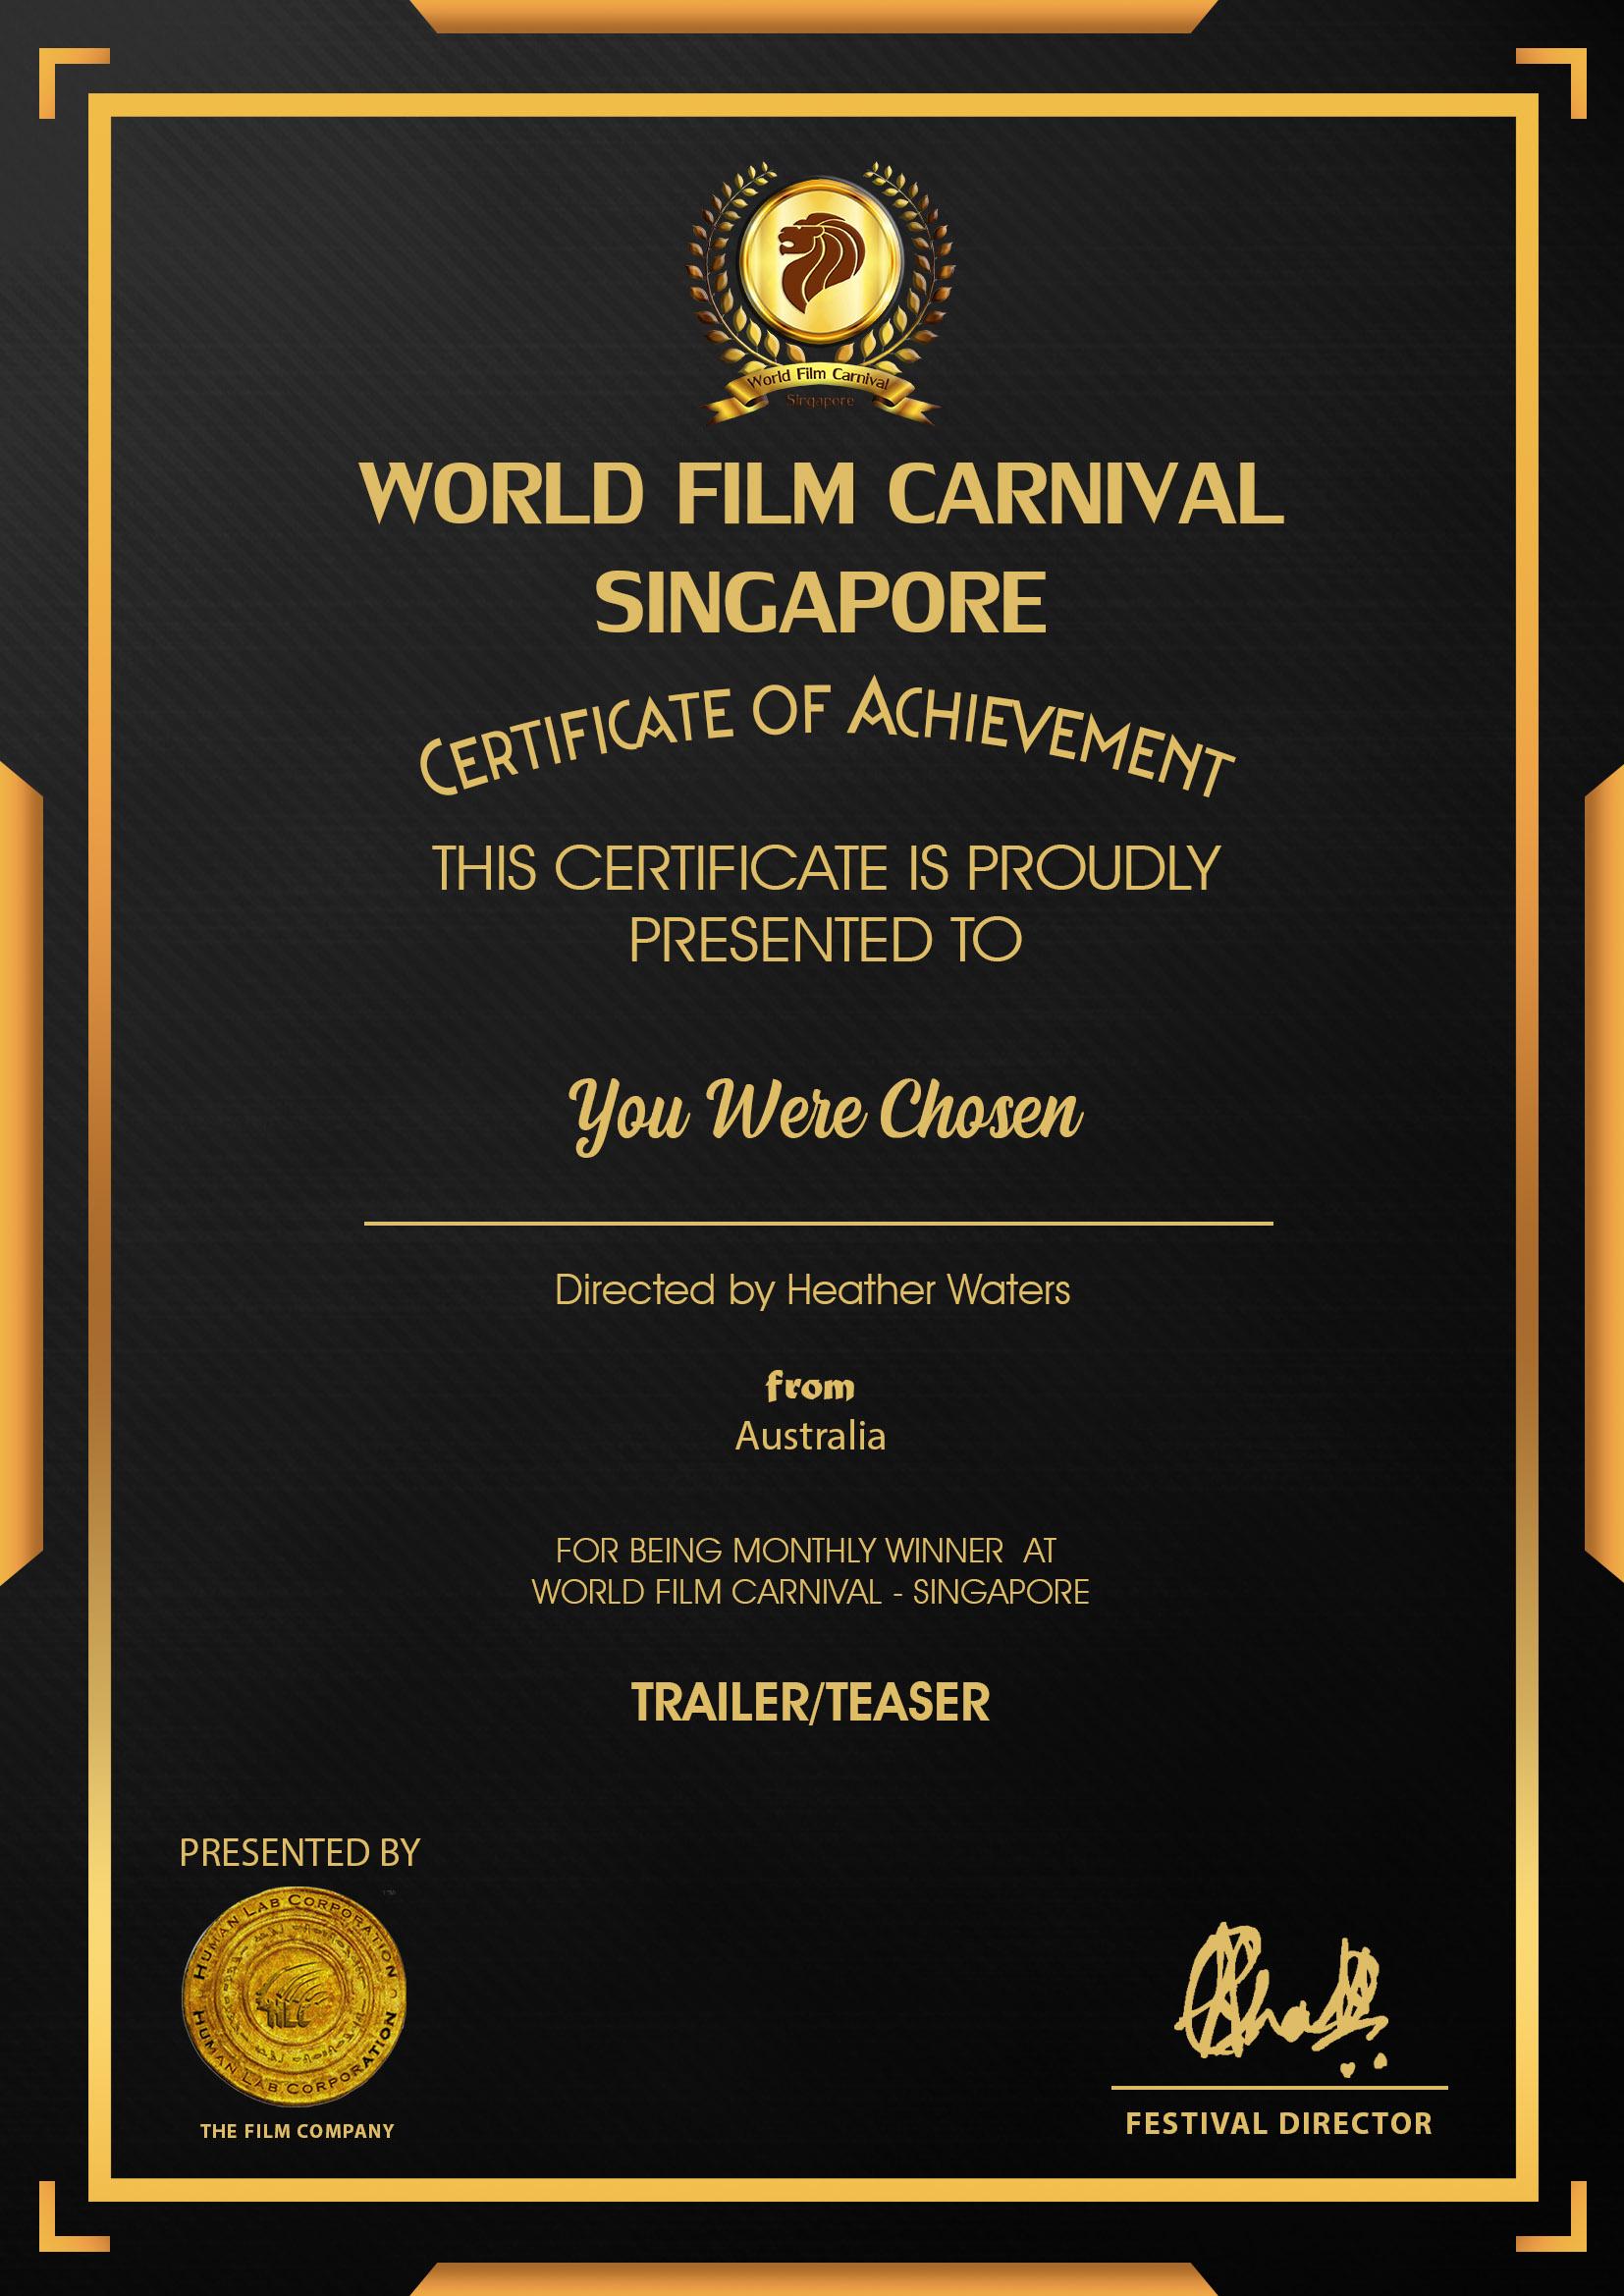 World Film Carnival Singapore